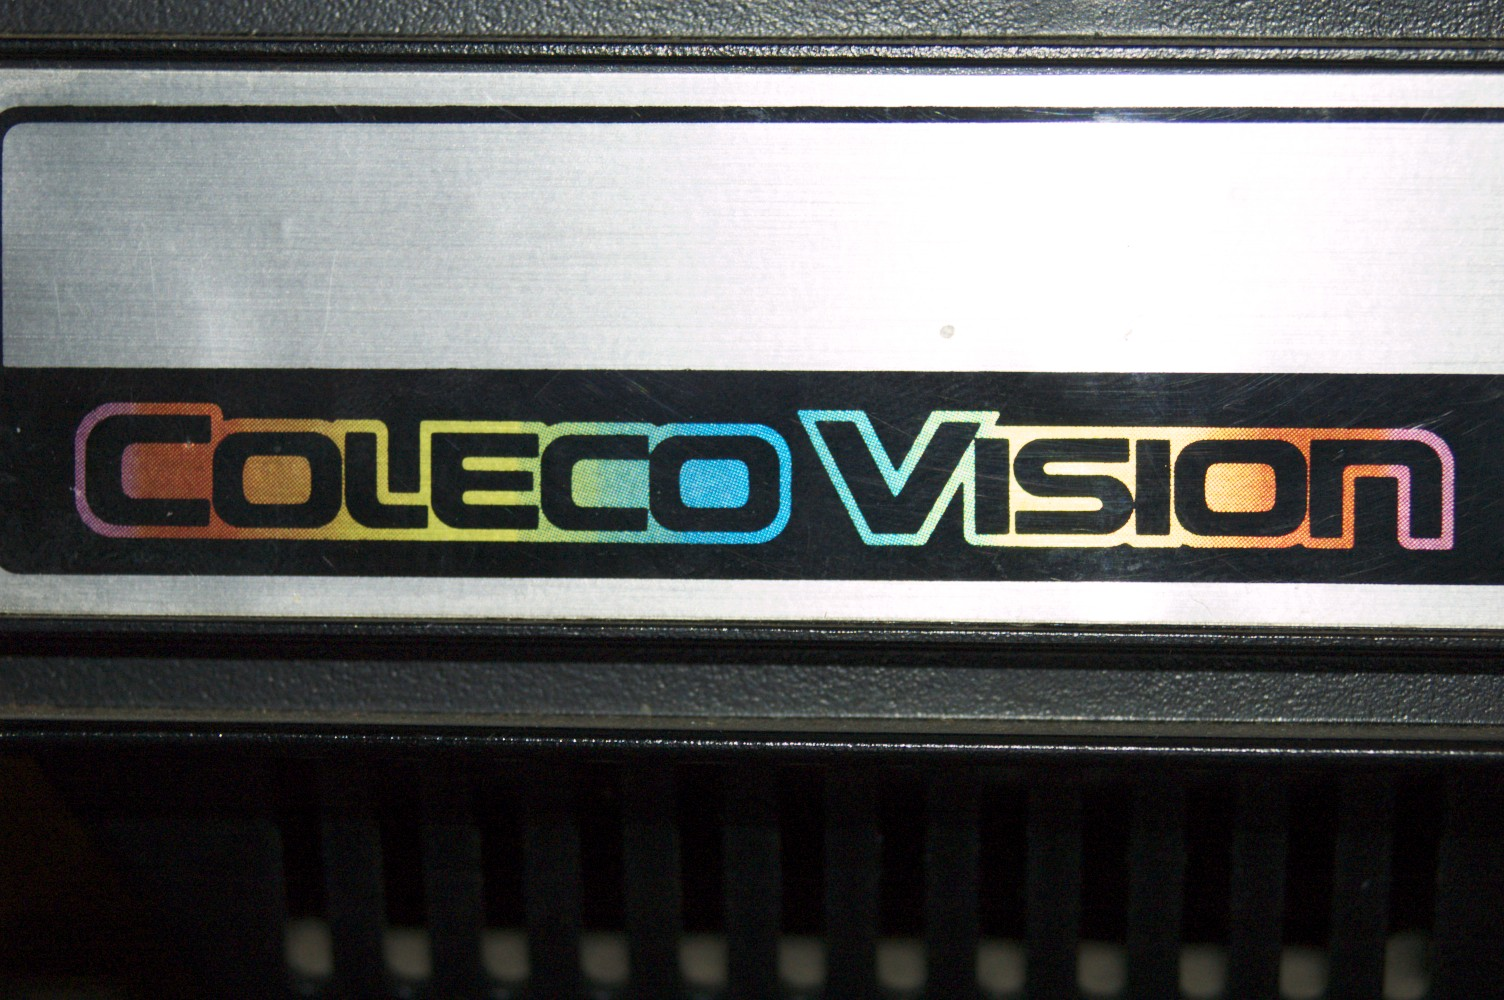 medium resolution of colecovision composite video